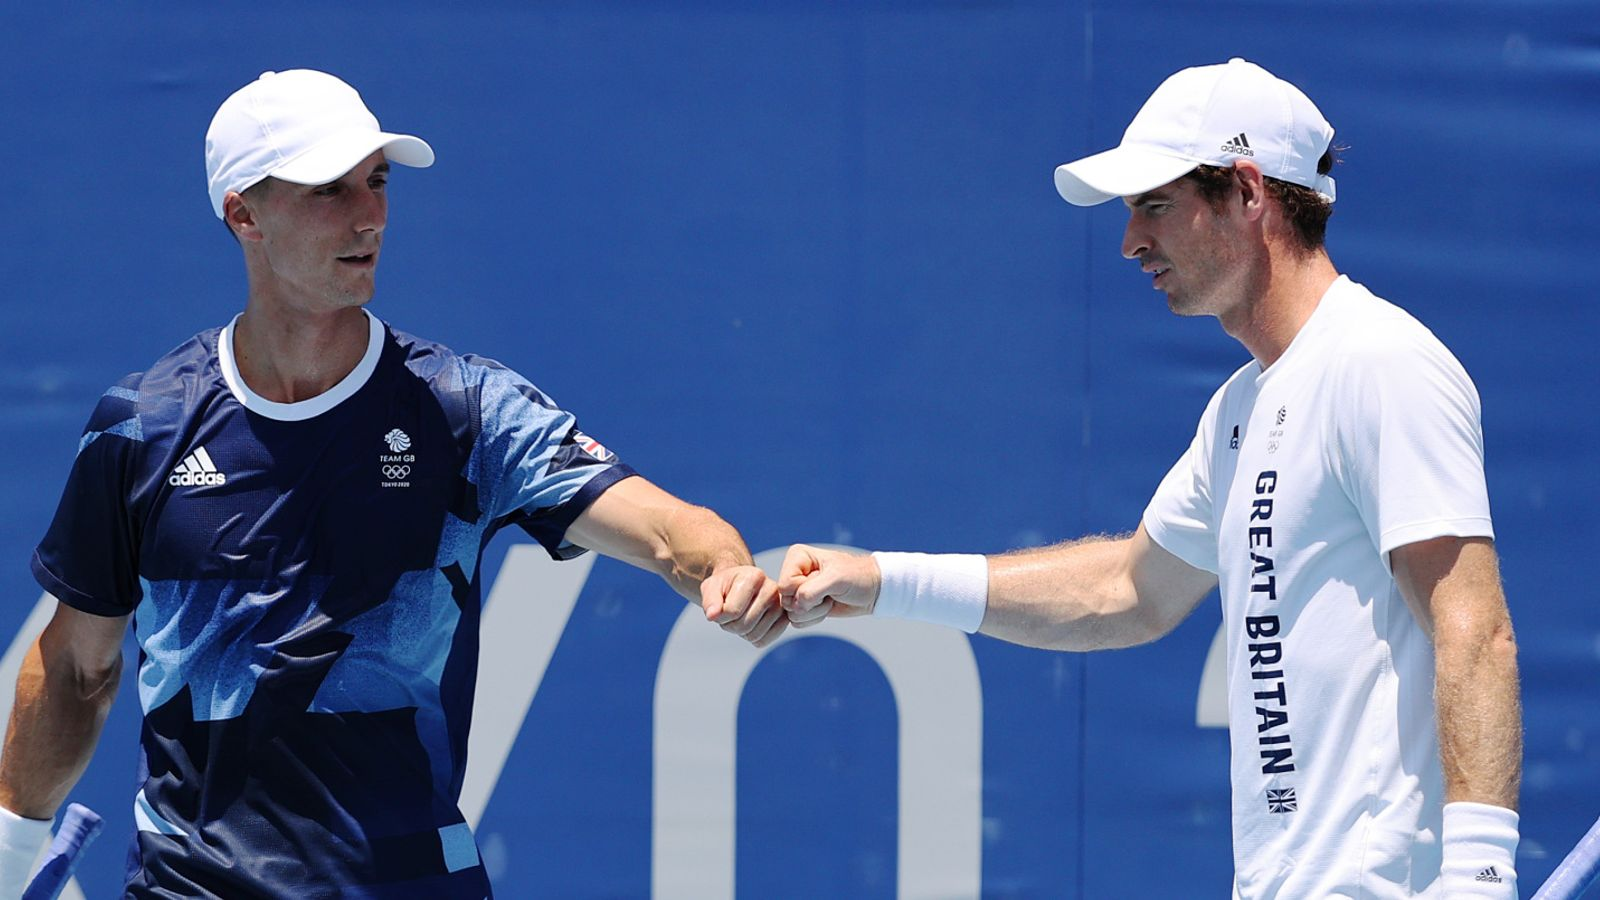 Tokyo Olympics: Andy Murray and Joe Salisbury through but Heather Watson knocked out